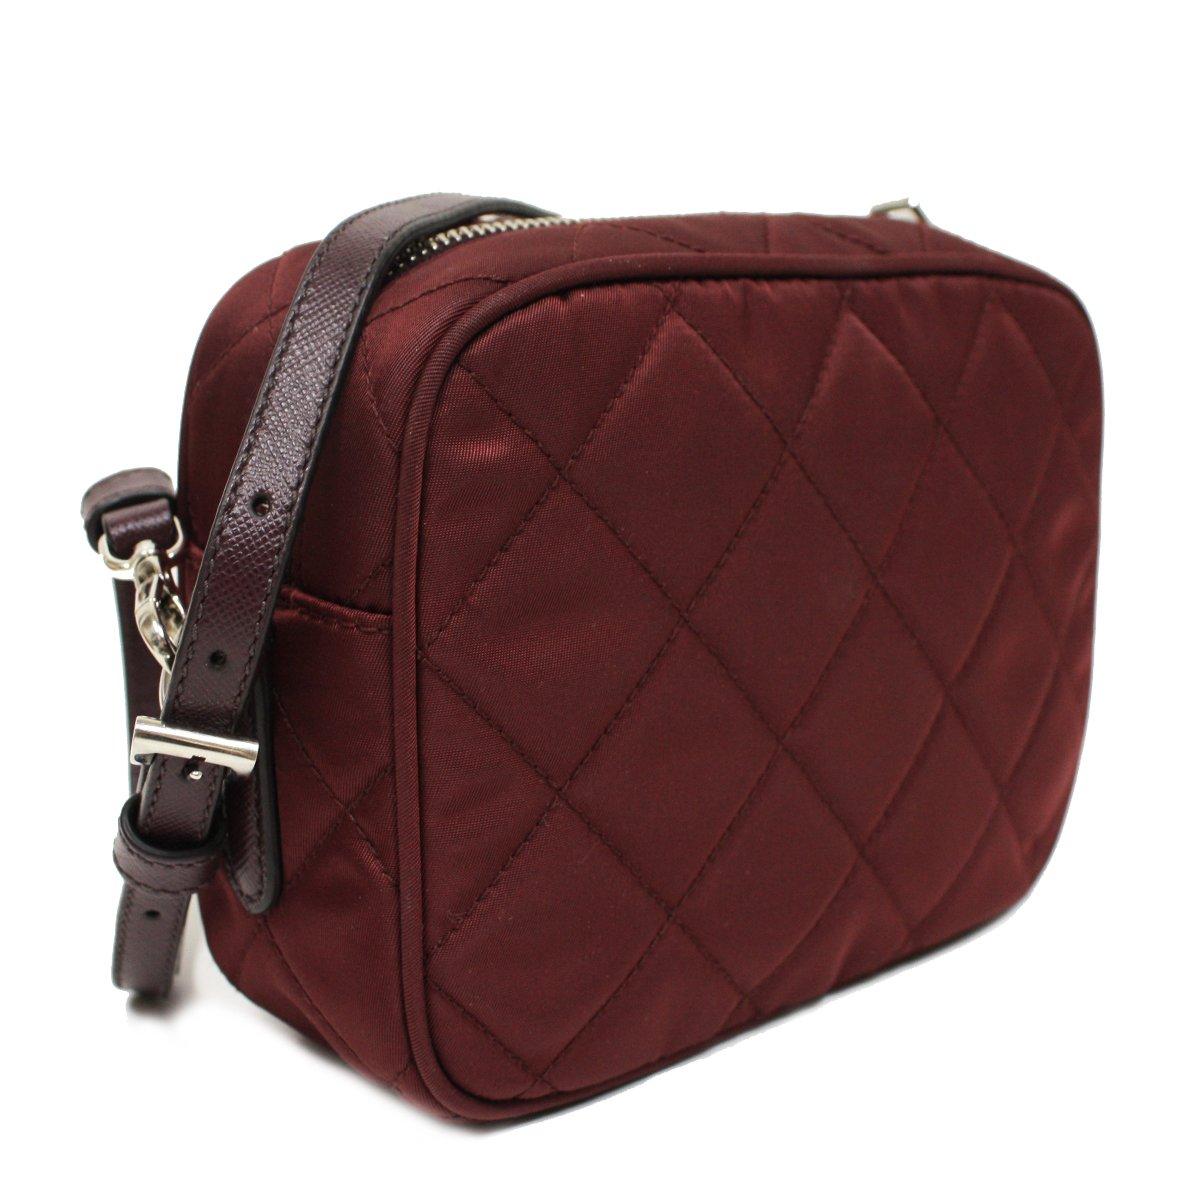 097de7ceb045 Prada Tessuto Impuntu Quilted Nylon and Leather Crossbody Shoulder Bag  BT1028 - Burgundy Crimson Red  Handbags  Amazon.com